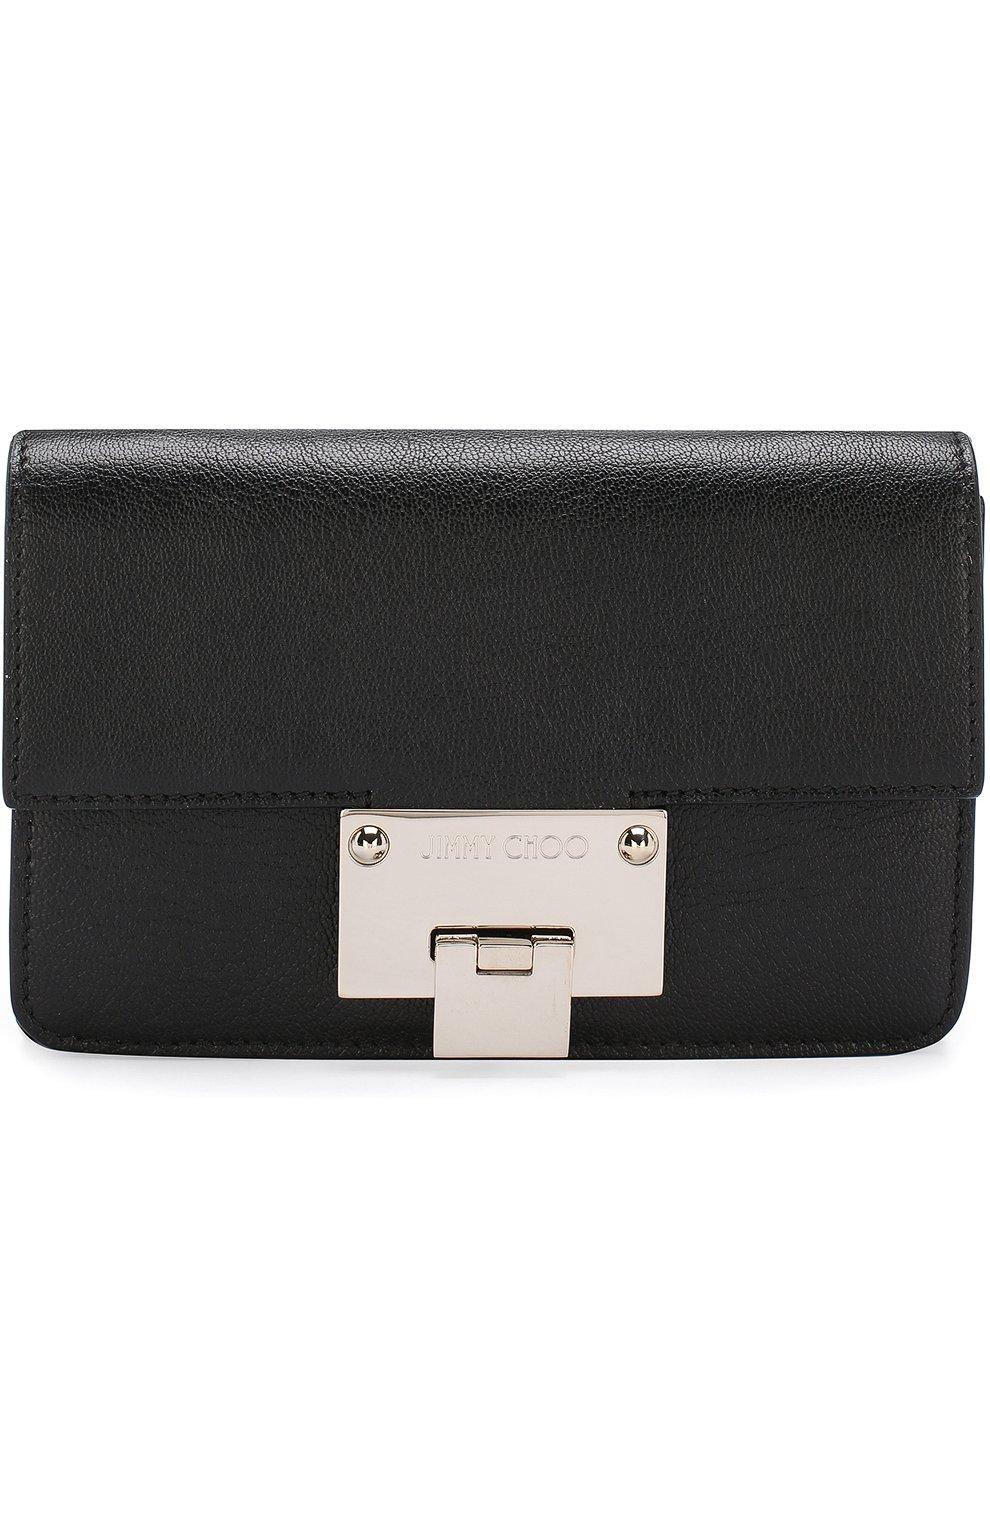 женская сумка Rebel Mini Jimmy Choo черная цвета купить за 53550